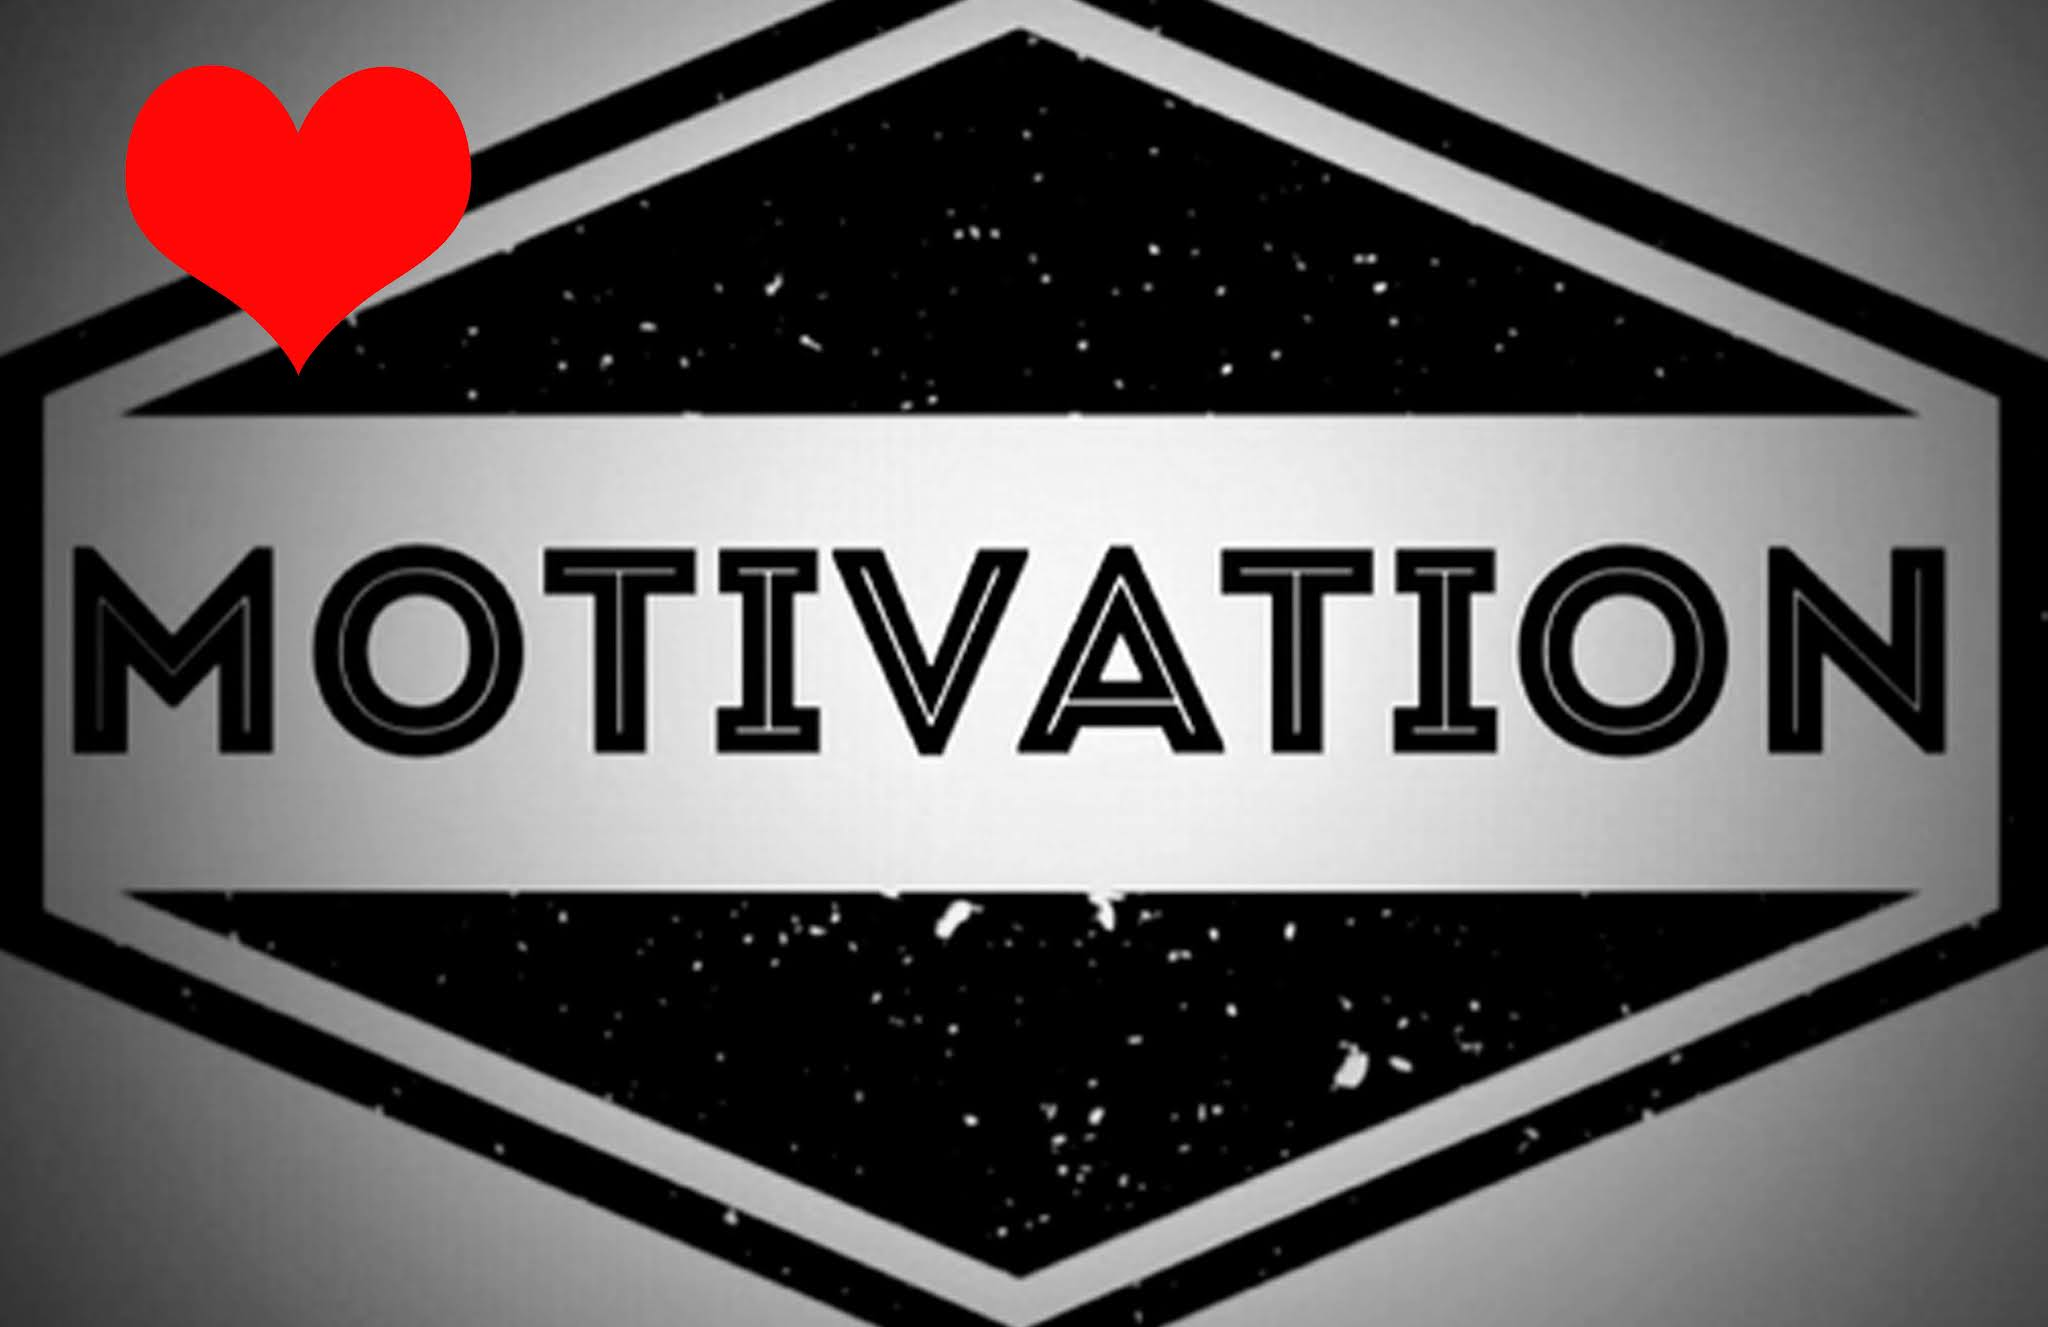 motivation, motivition, motivational status, motivational pic, motivation bangla, motivational book, motivation words, motivation in tagalog, self improvement